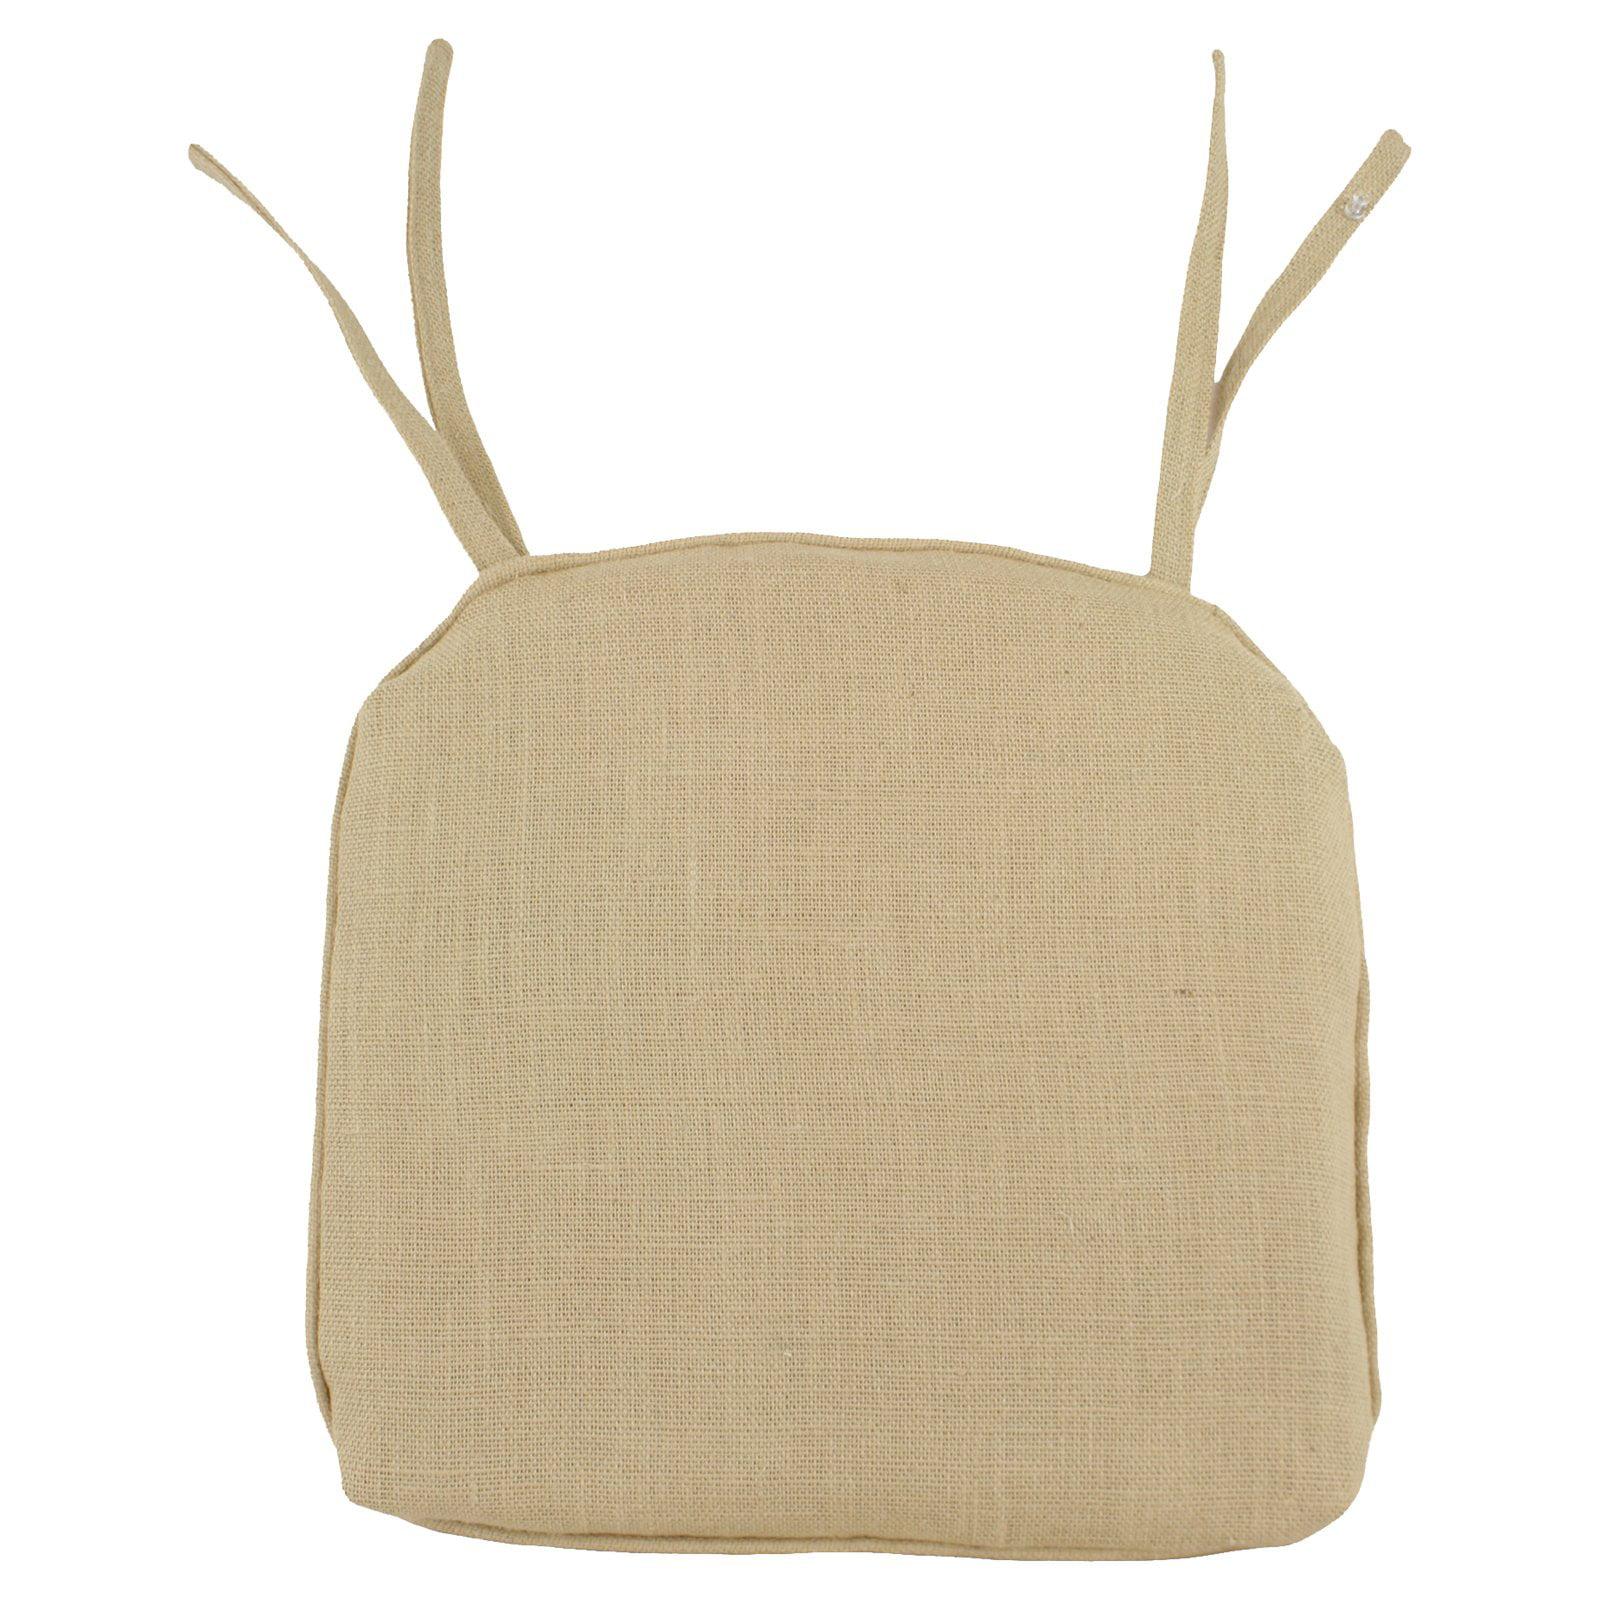 Brite Ideas Living Burlap 17 x 17 in Pleated Foam Seat Cushion